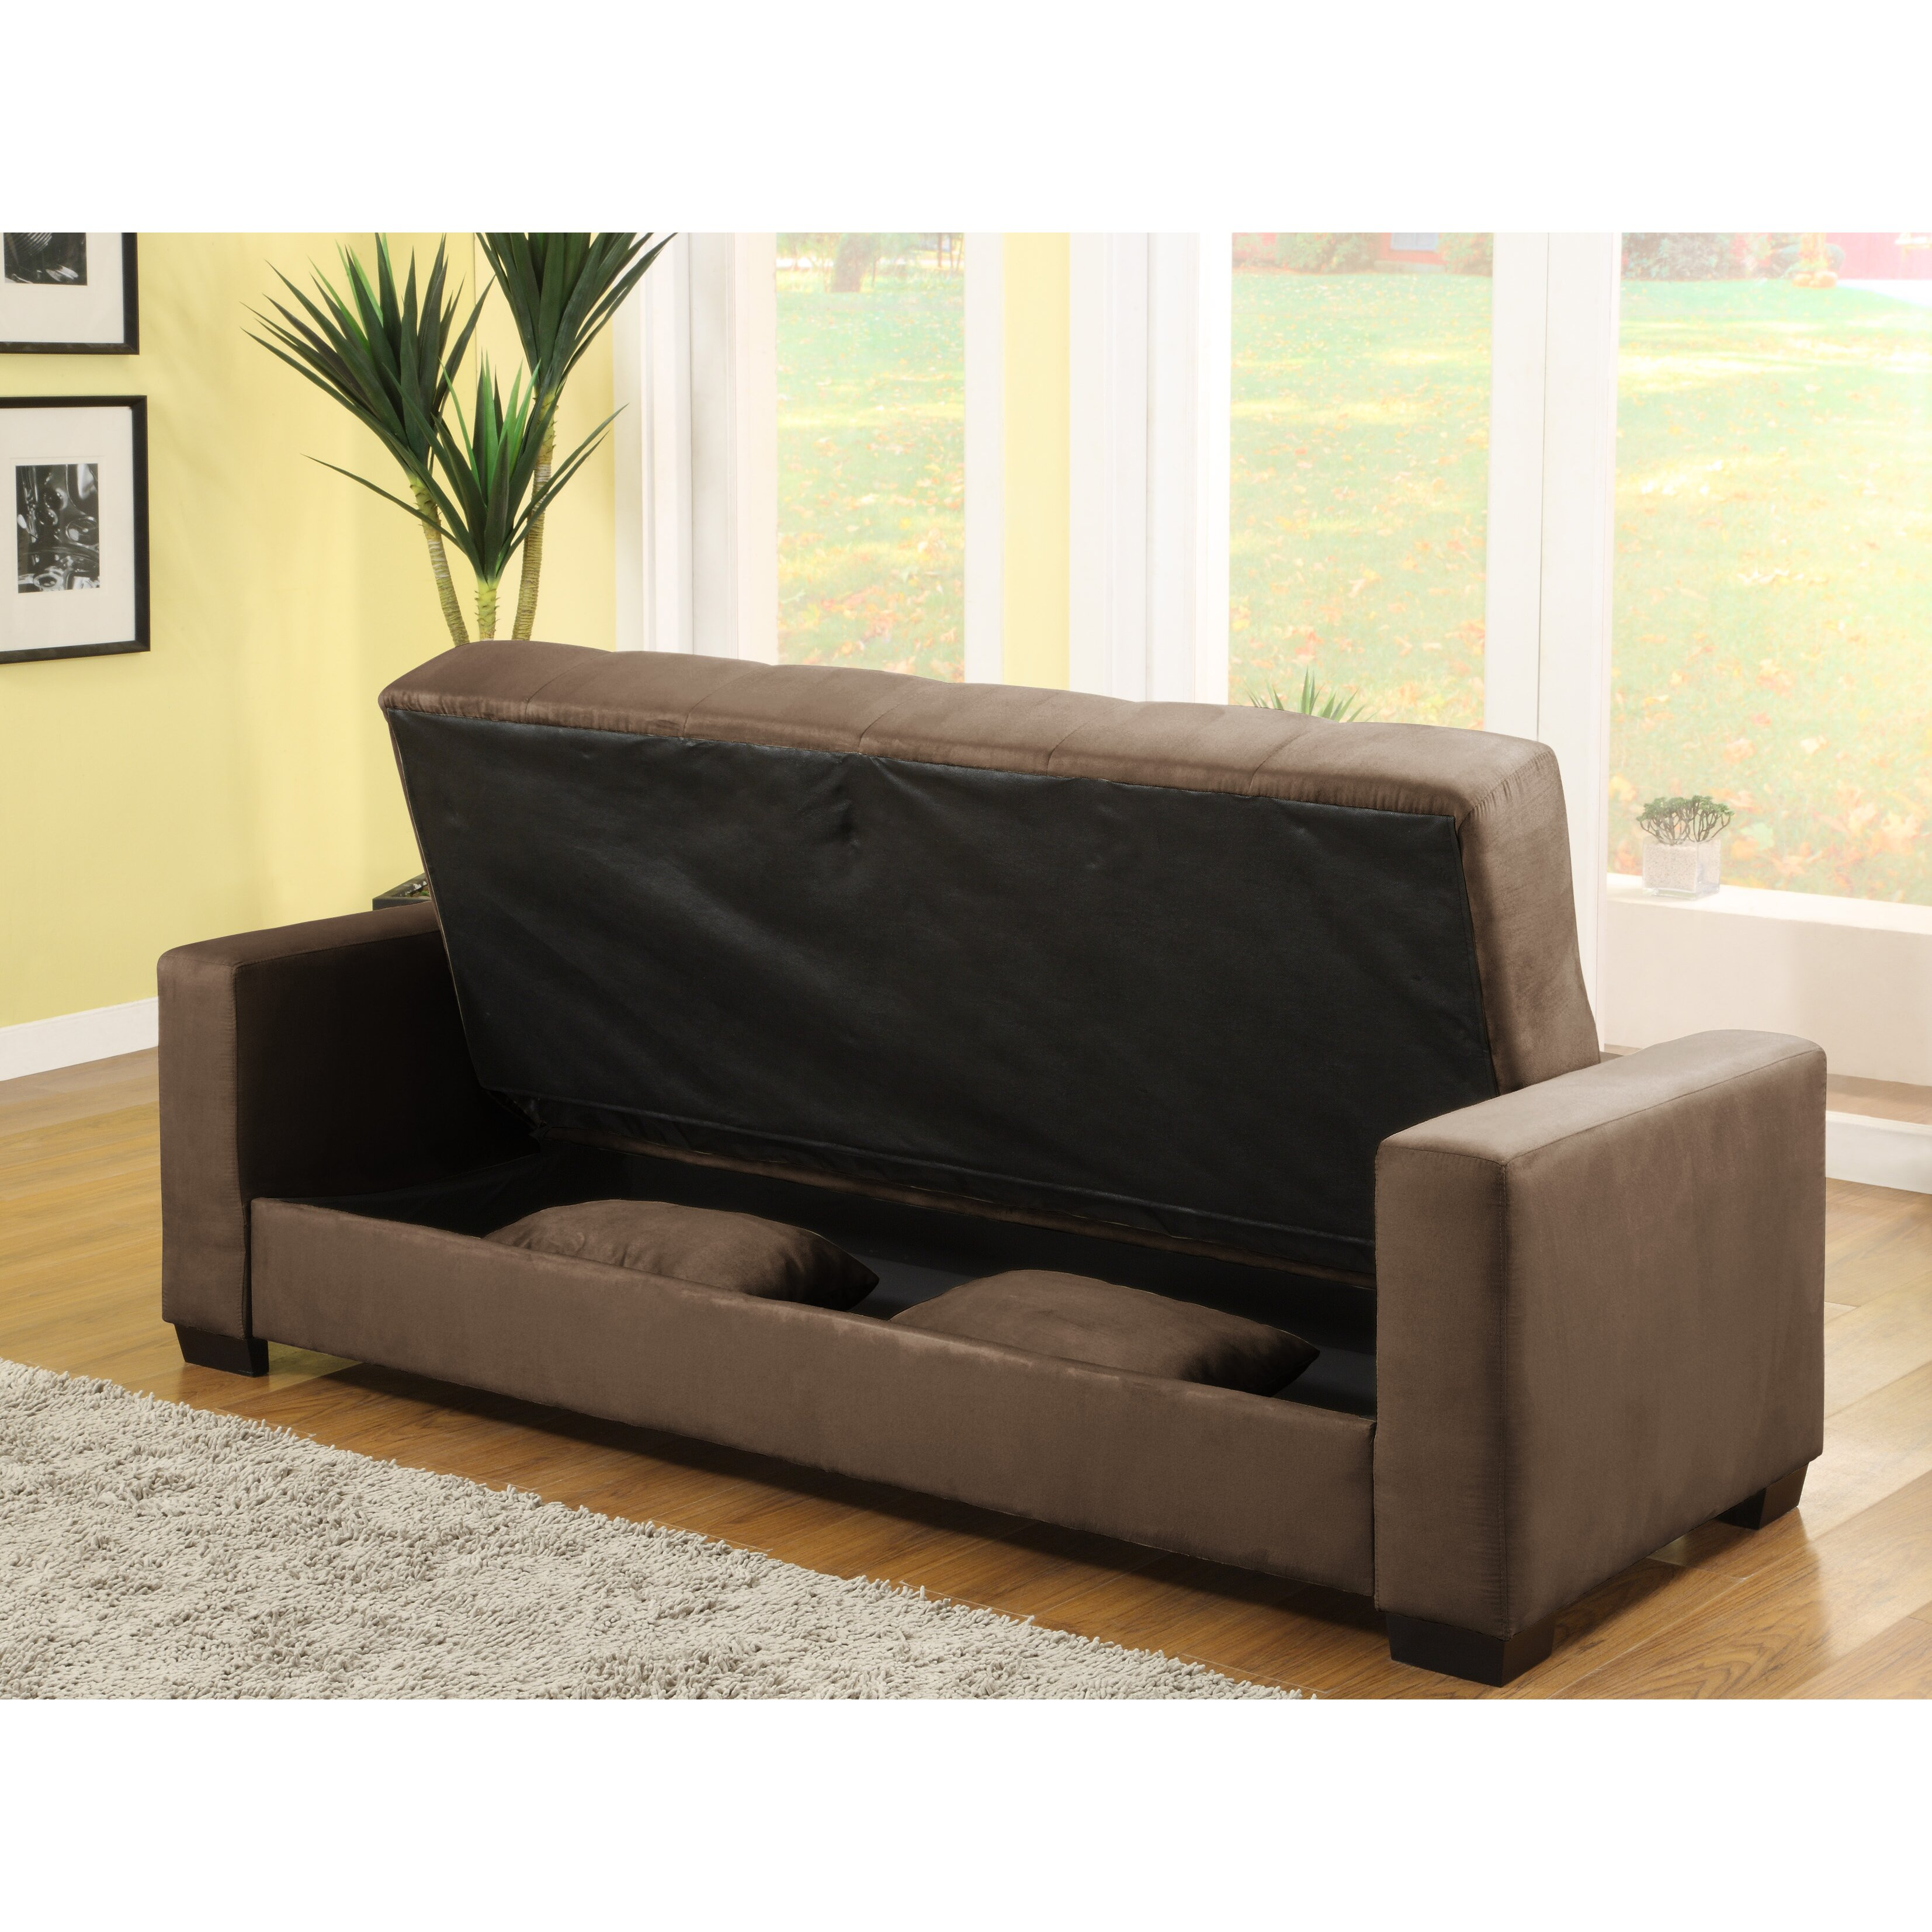 LifeStyle Solutions Napa Sleeper Sofa & Reviews